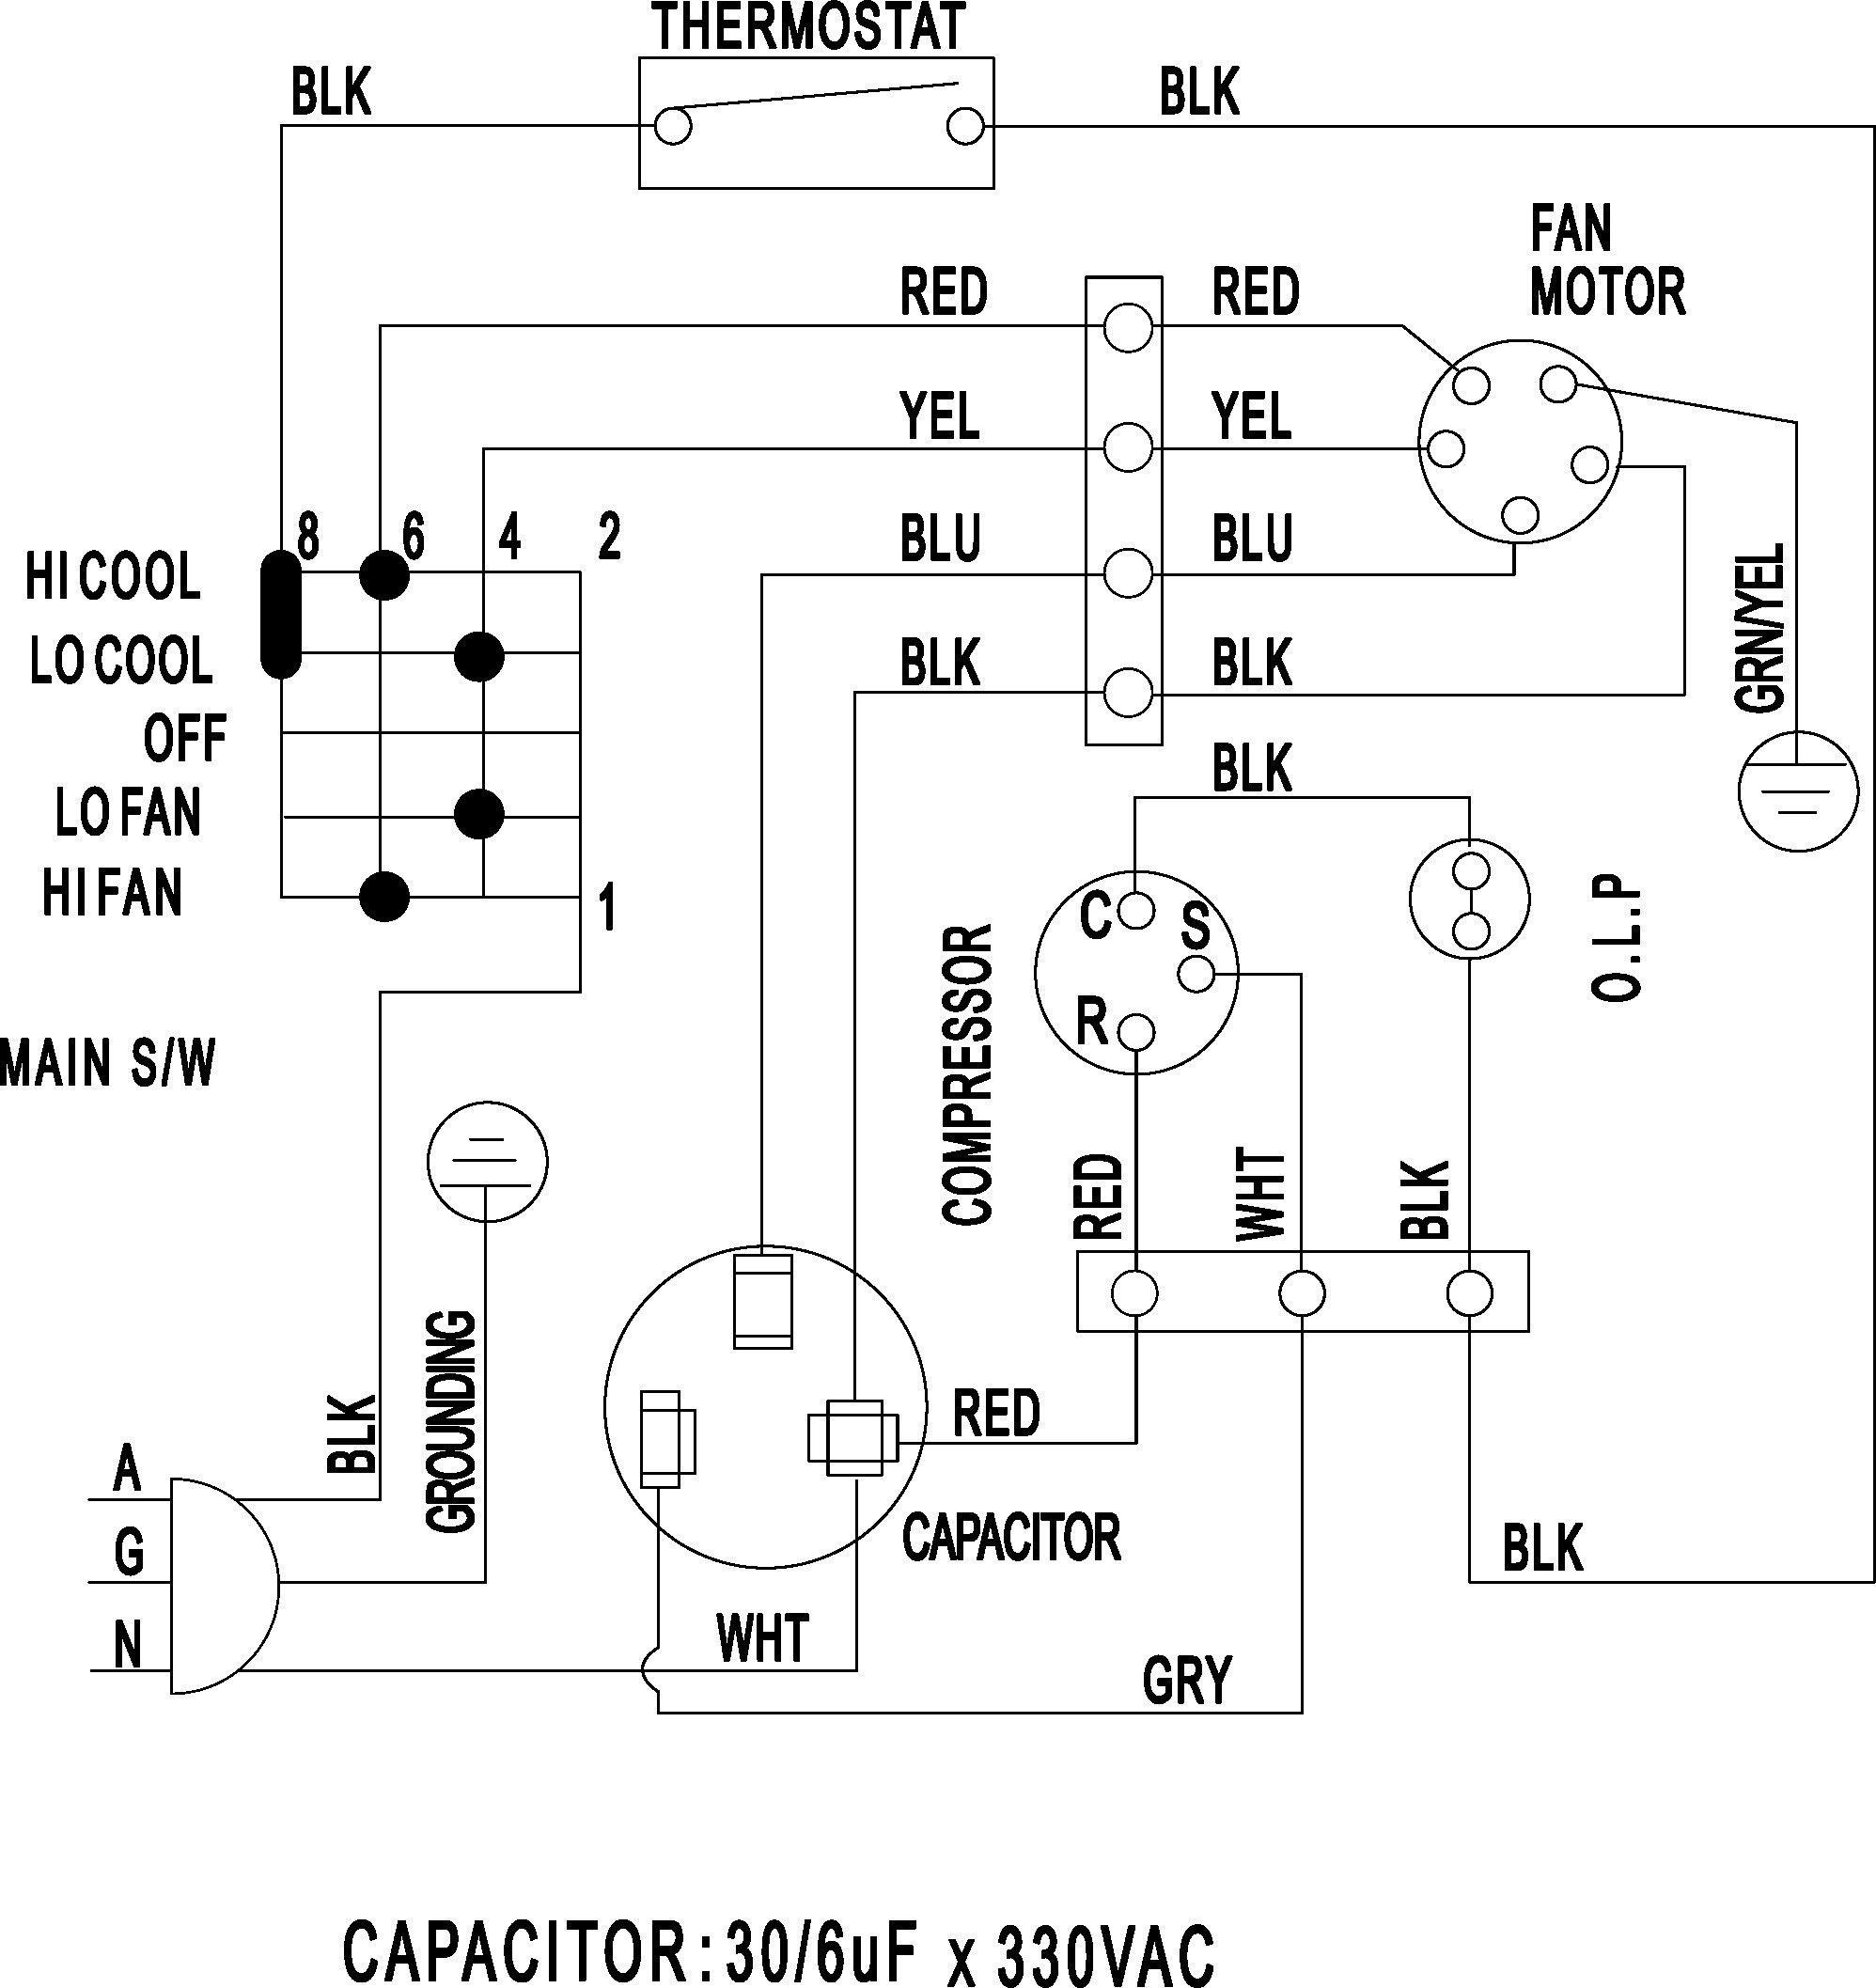 New Types Of Wirings Diagram Wiringdiagram Diagramming Diagramm Visuals Visualisation Gra Ac Wiring Electrical Circuit Diagram Electrical Wiring Diagram